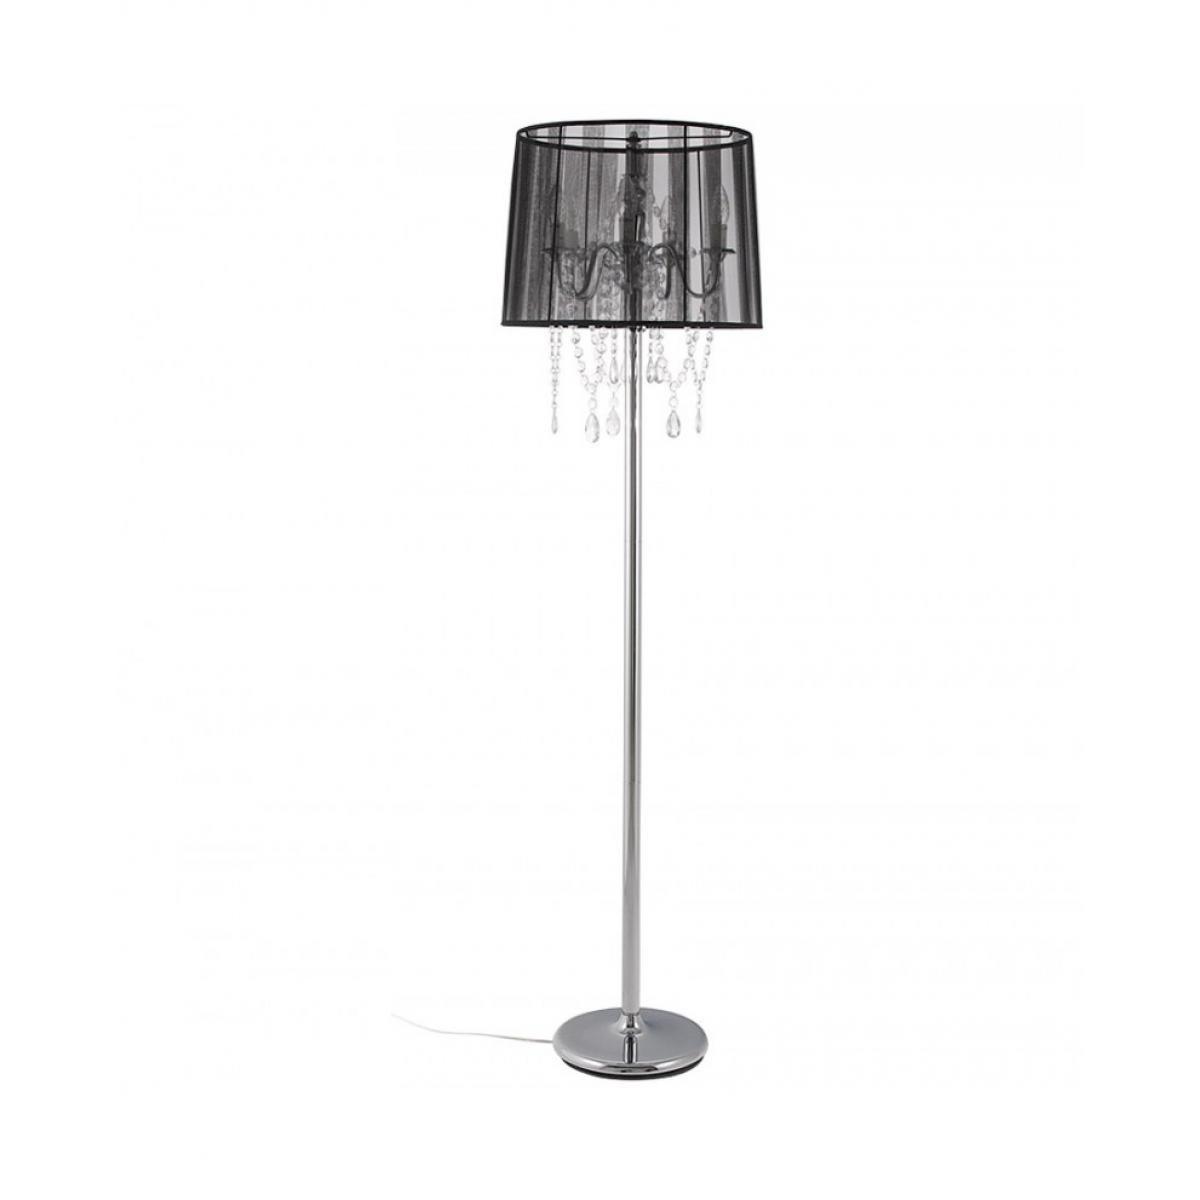 Kokoon Design Lampe de sol design LOUNGE BLACK 45x45x165 cm